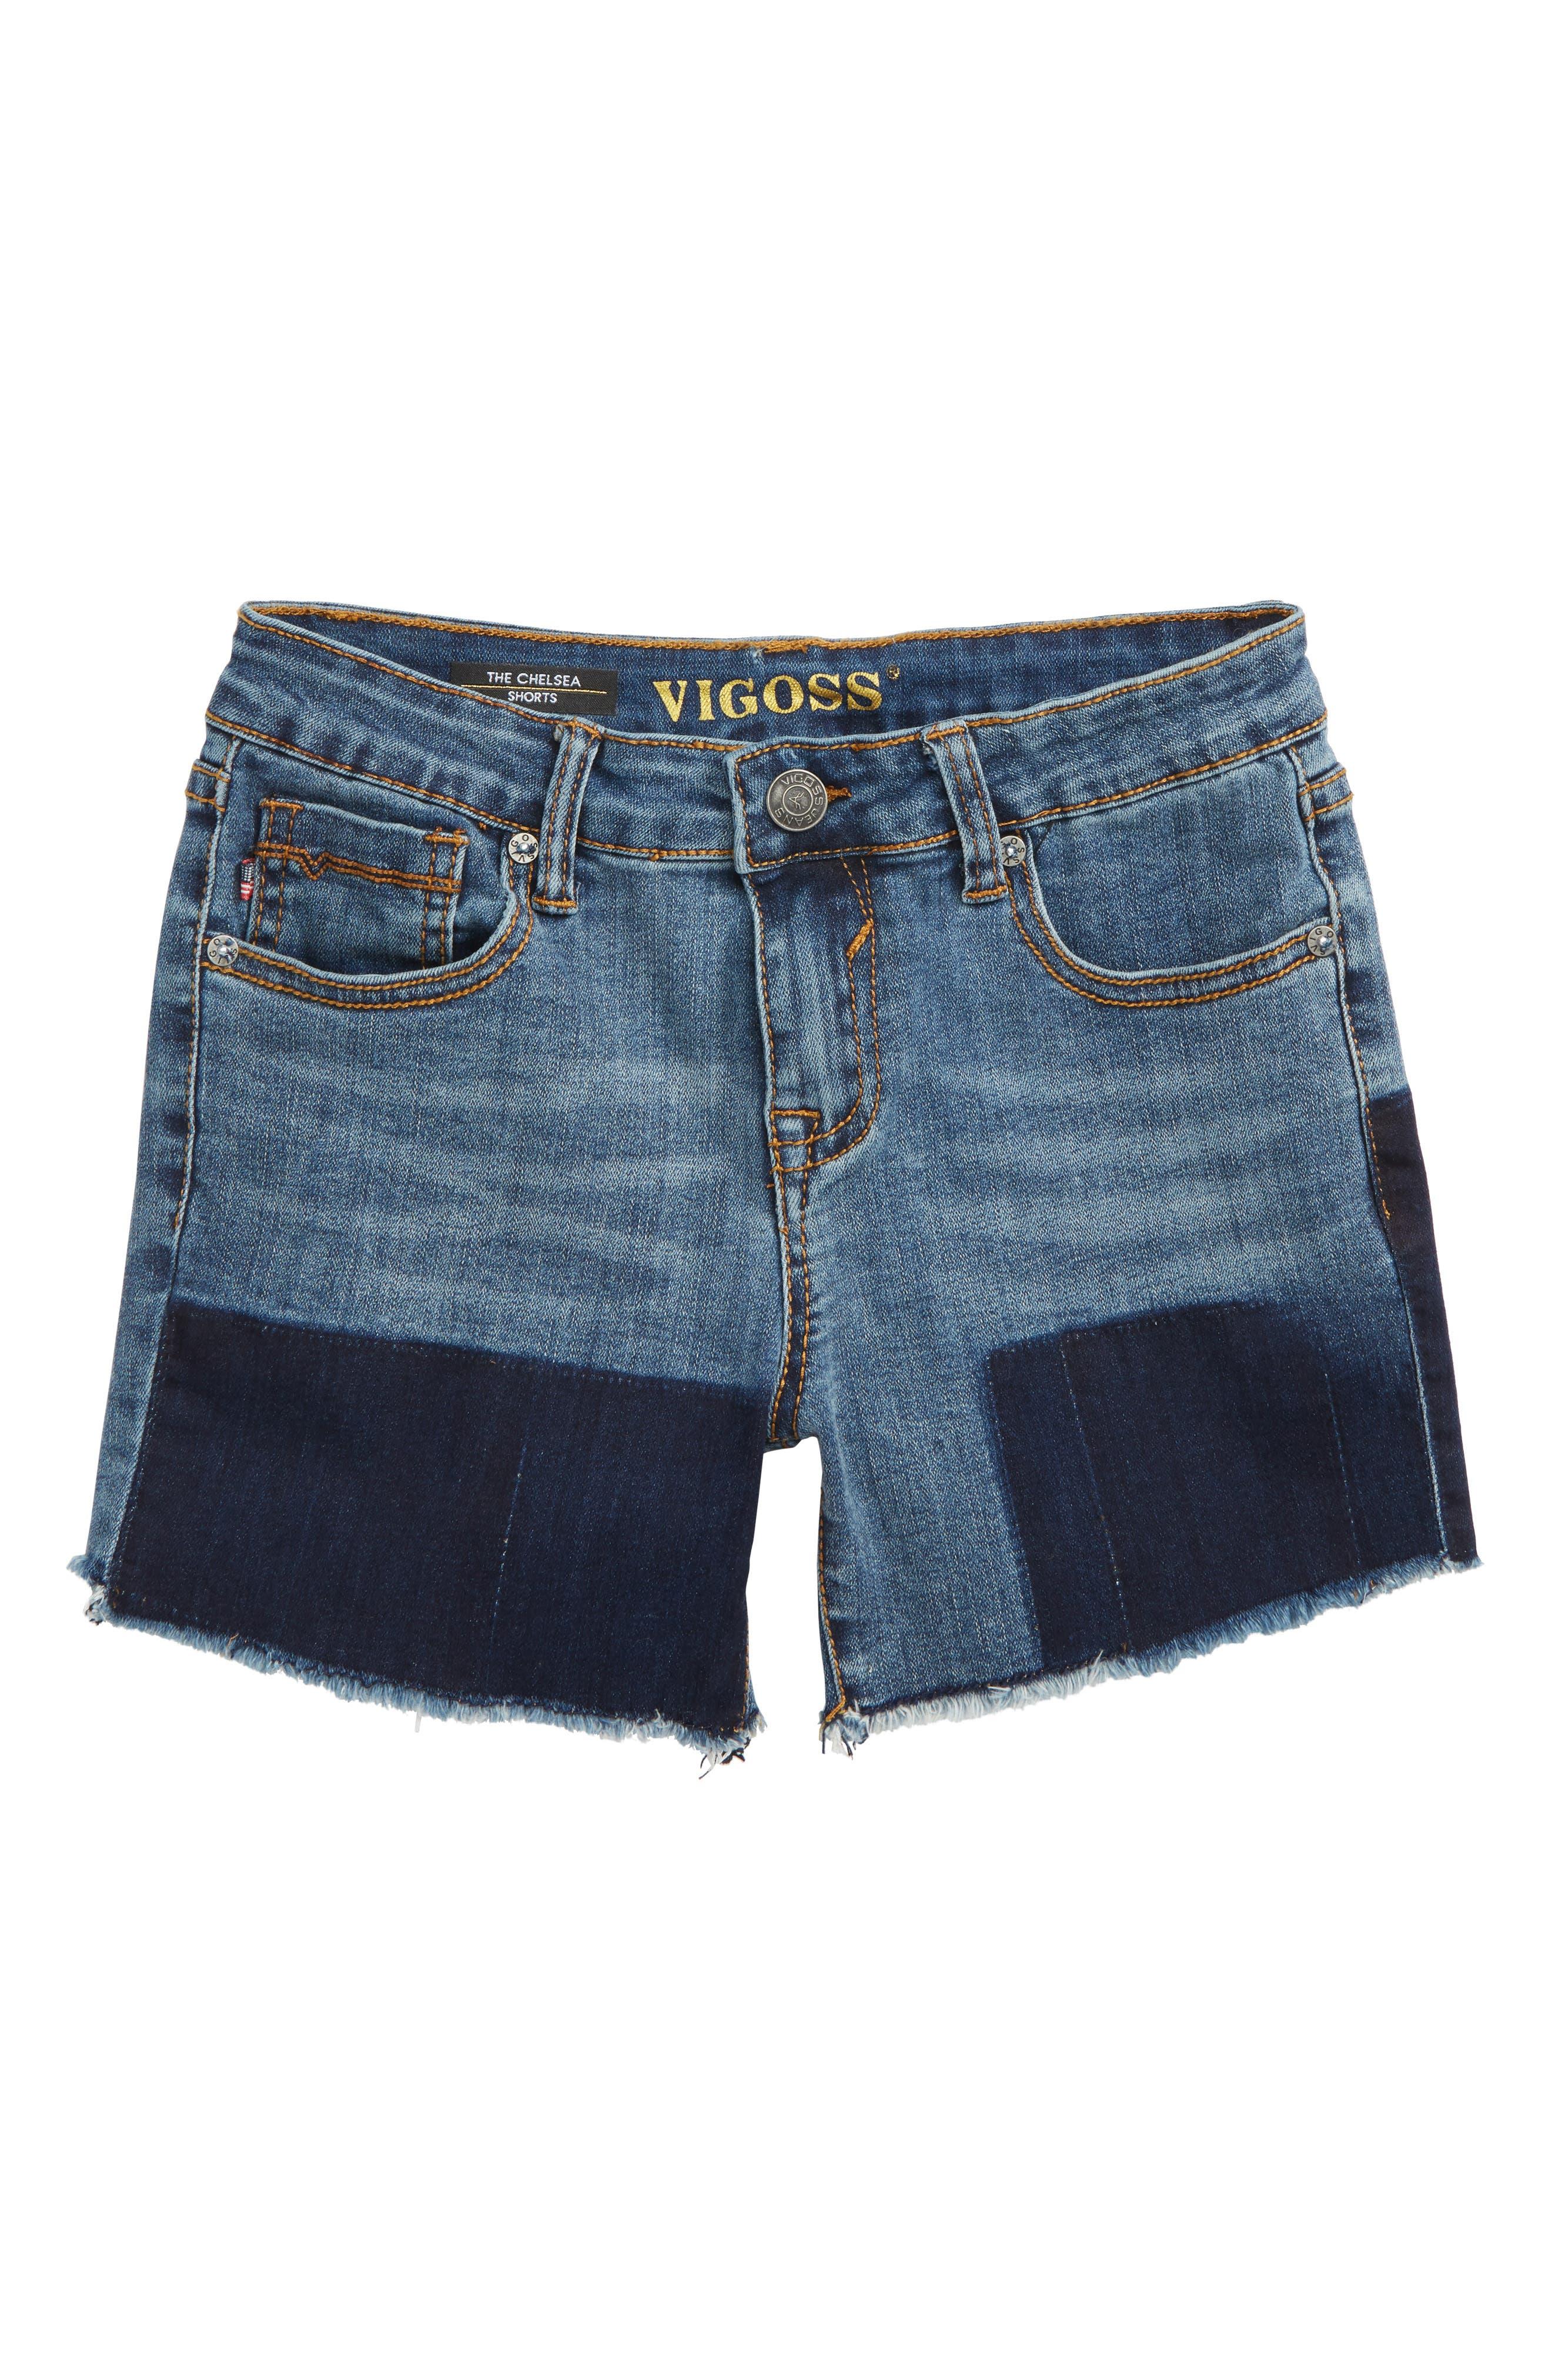 Vigoss Shadow Frayed Cutoff Denim Shorts (Big Girls)